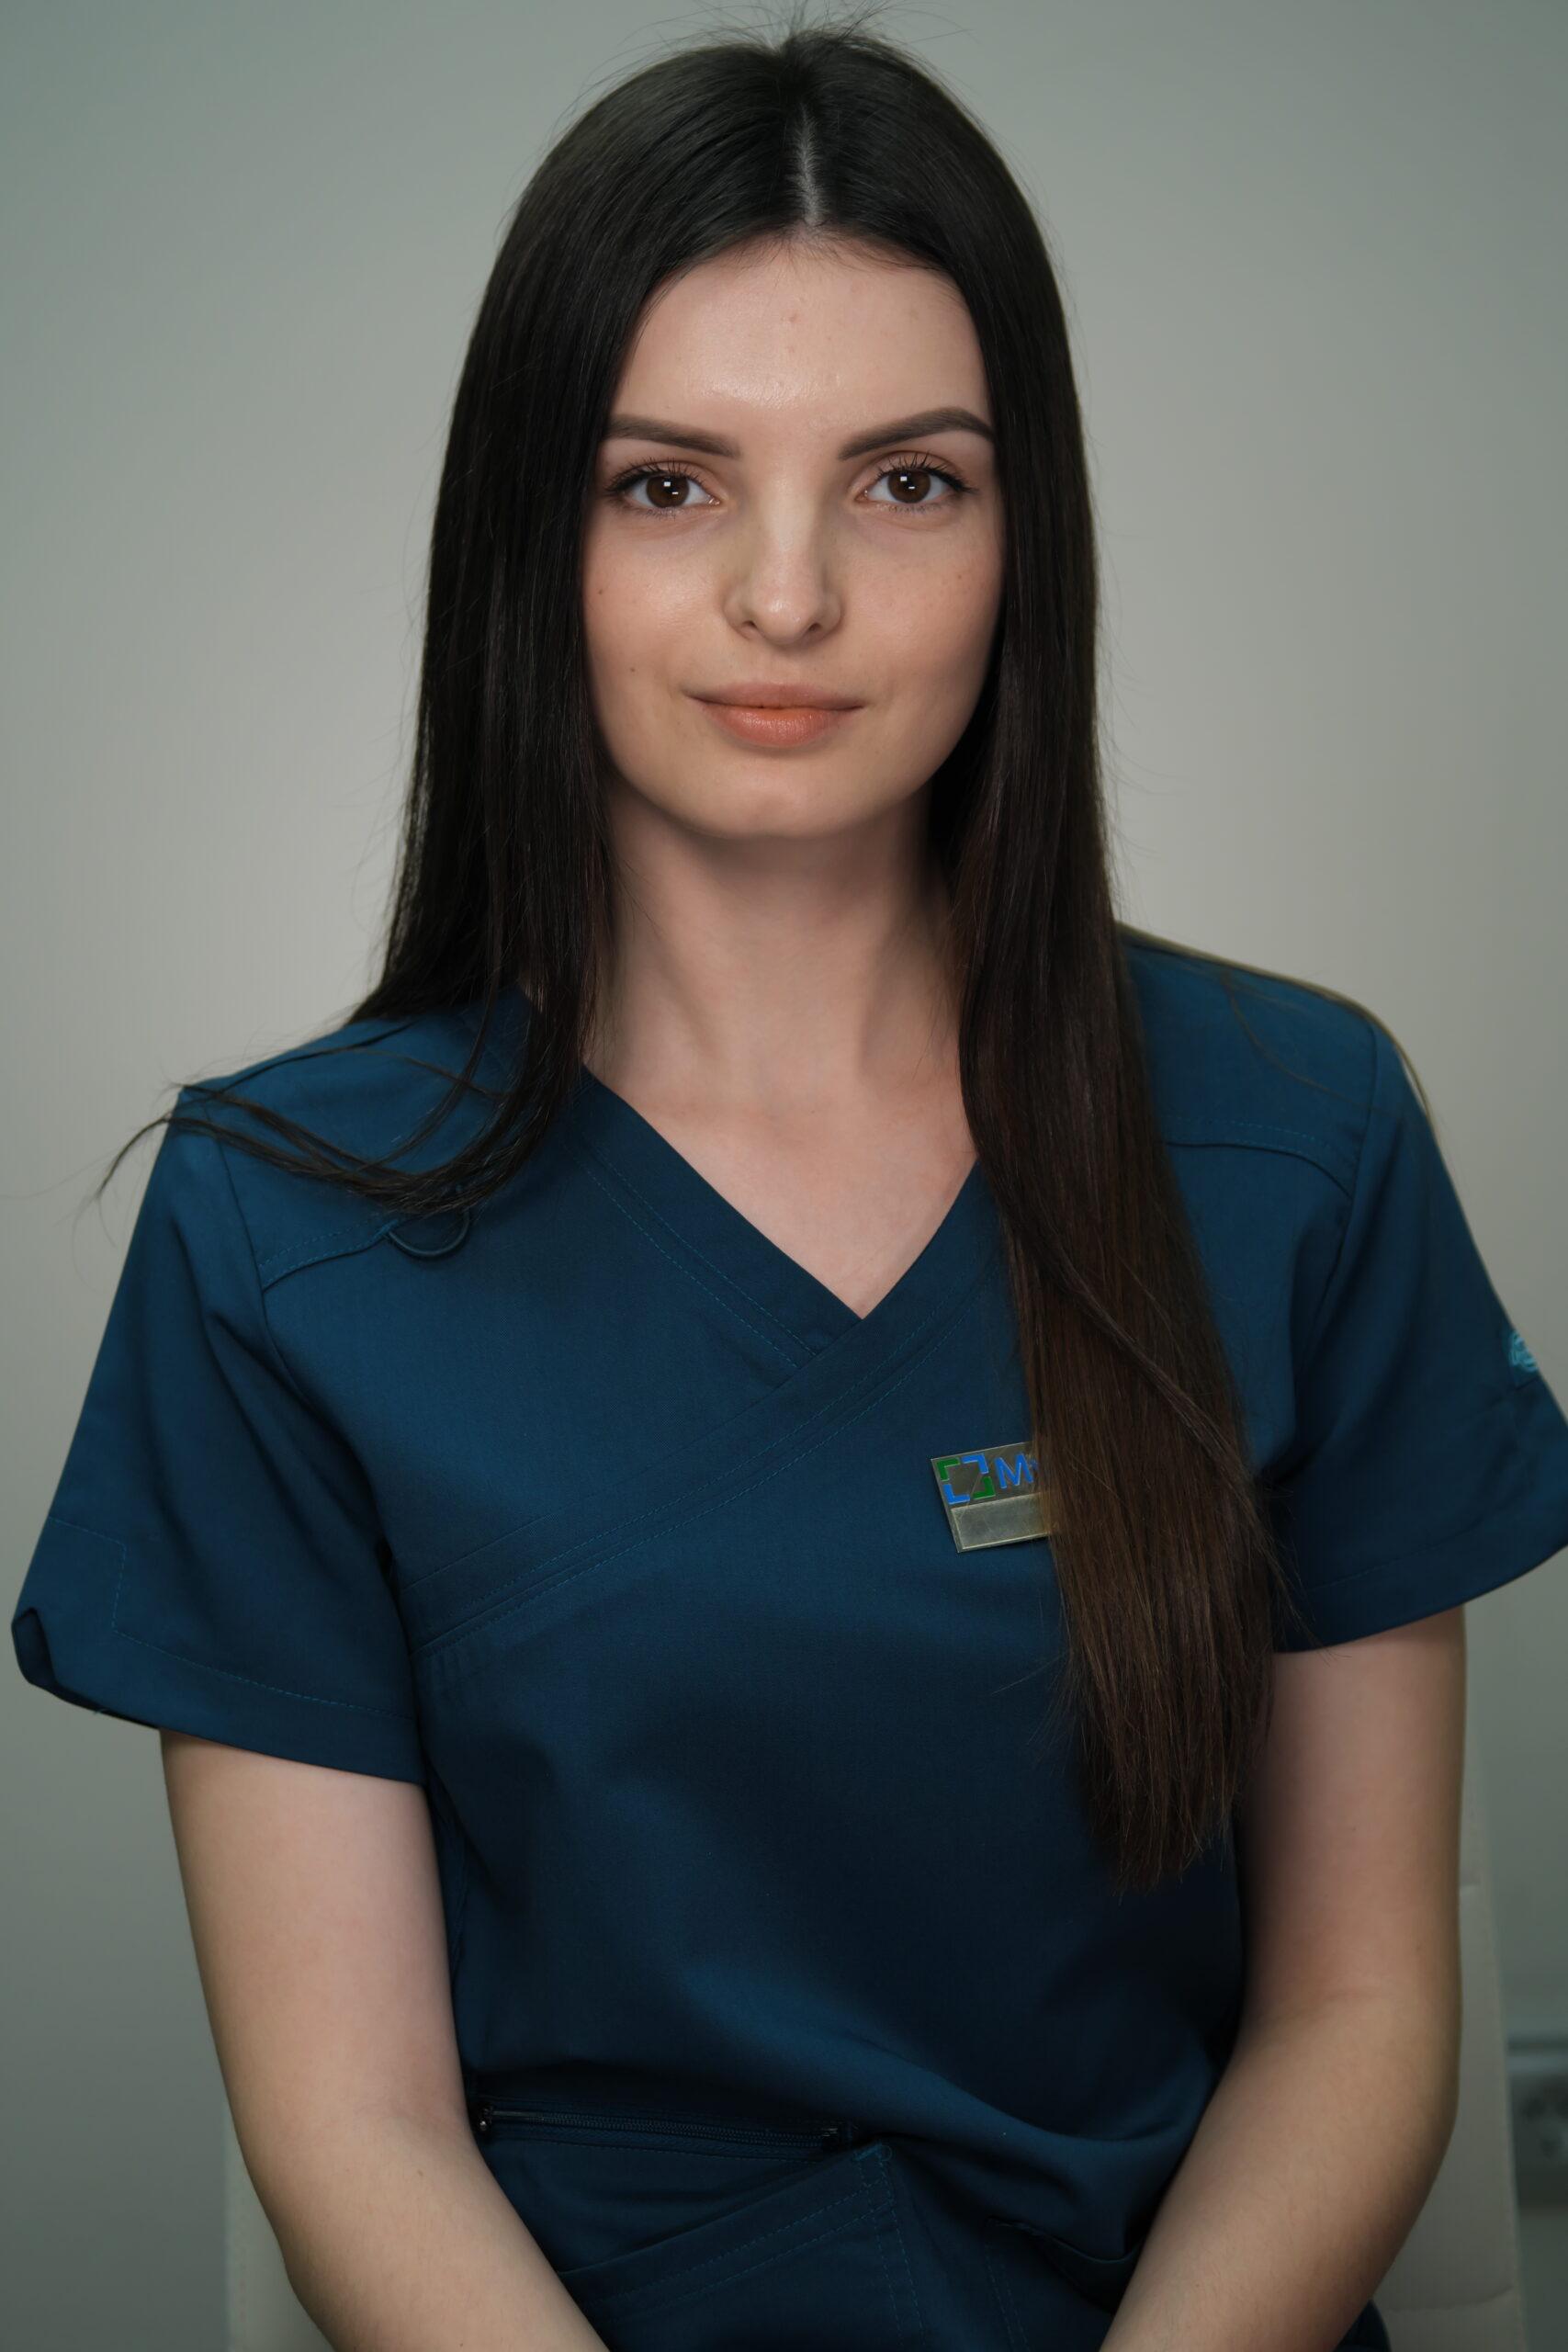 specialist image